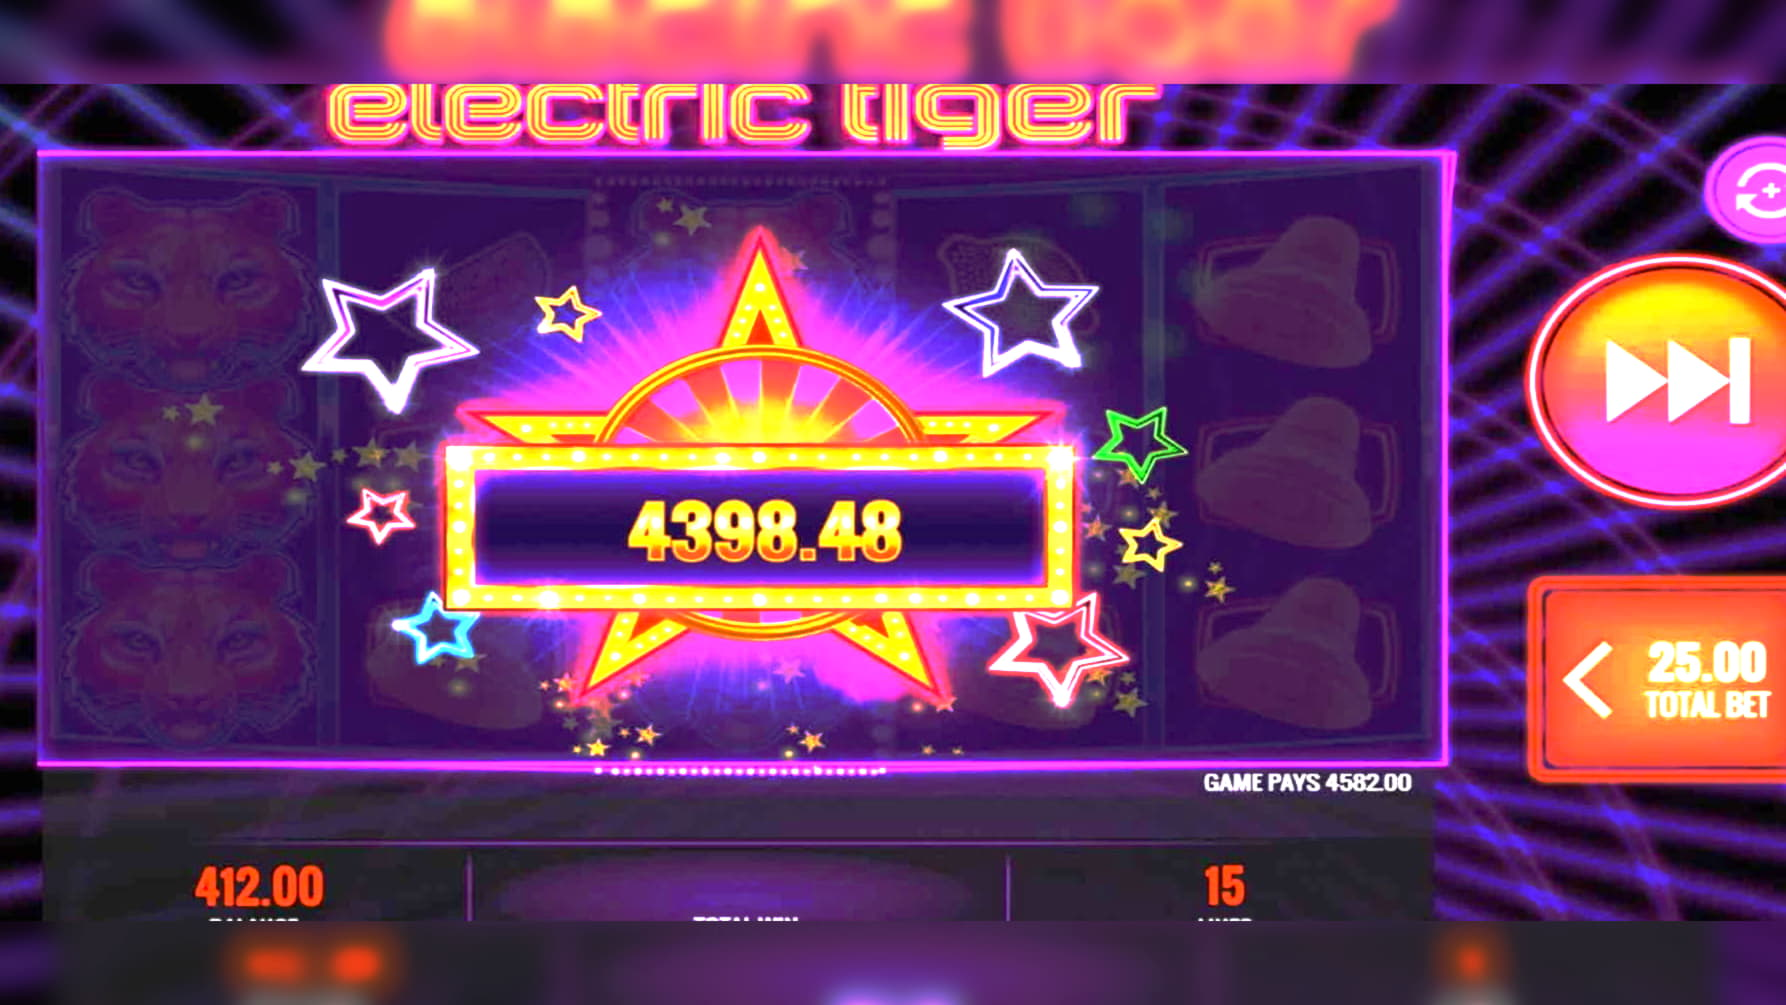 500nodepositbonus kodet2020 lojëra elektronike